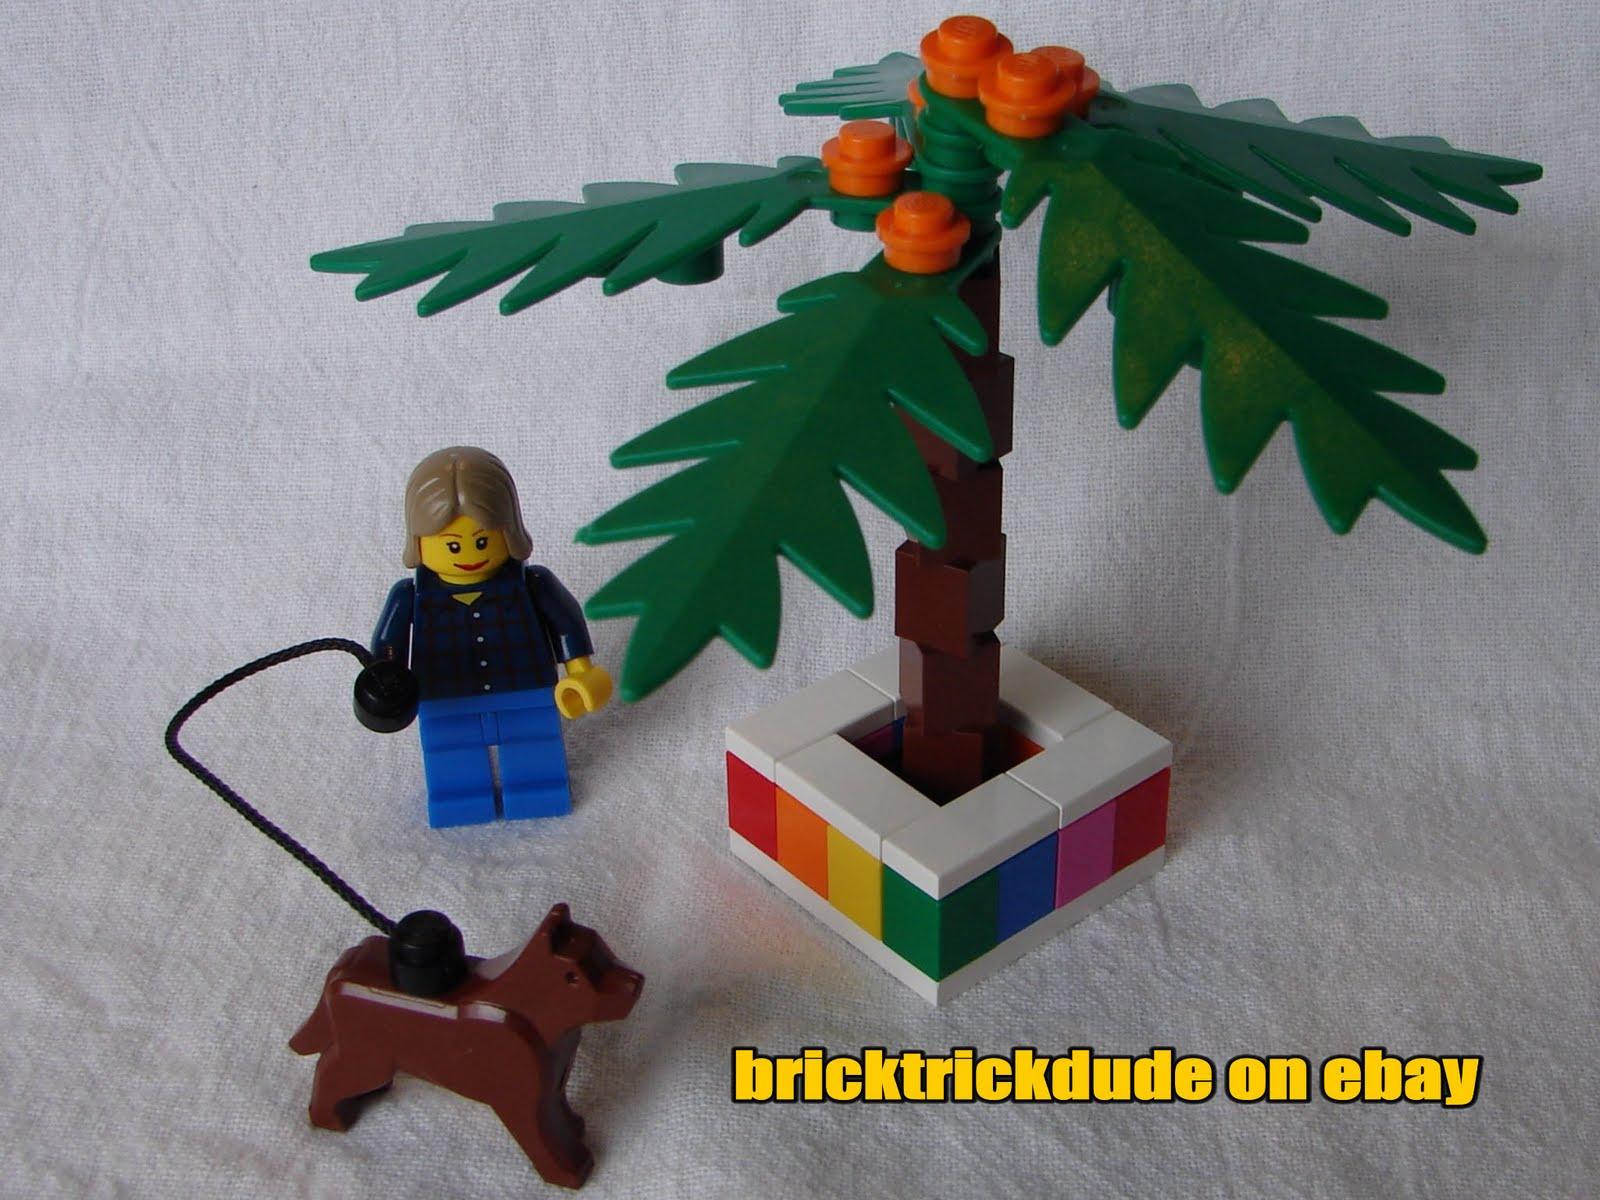 Brick Trick August 2010